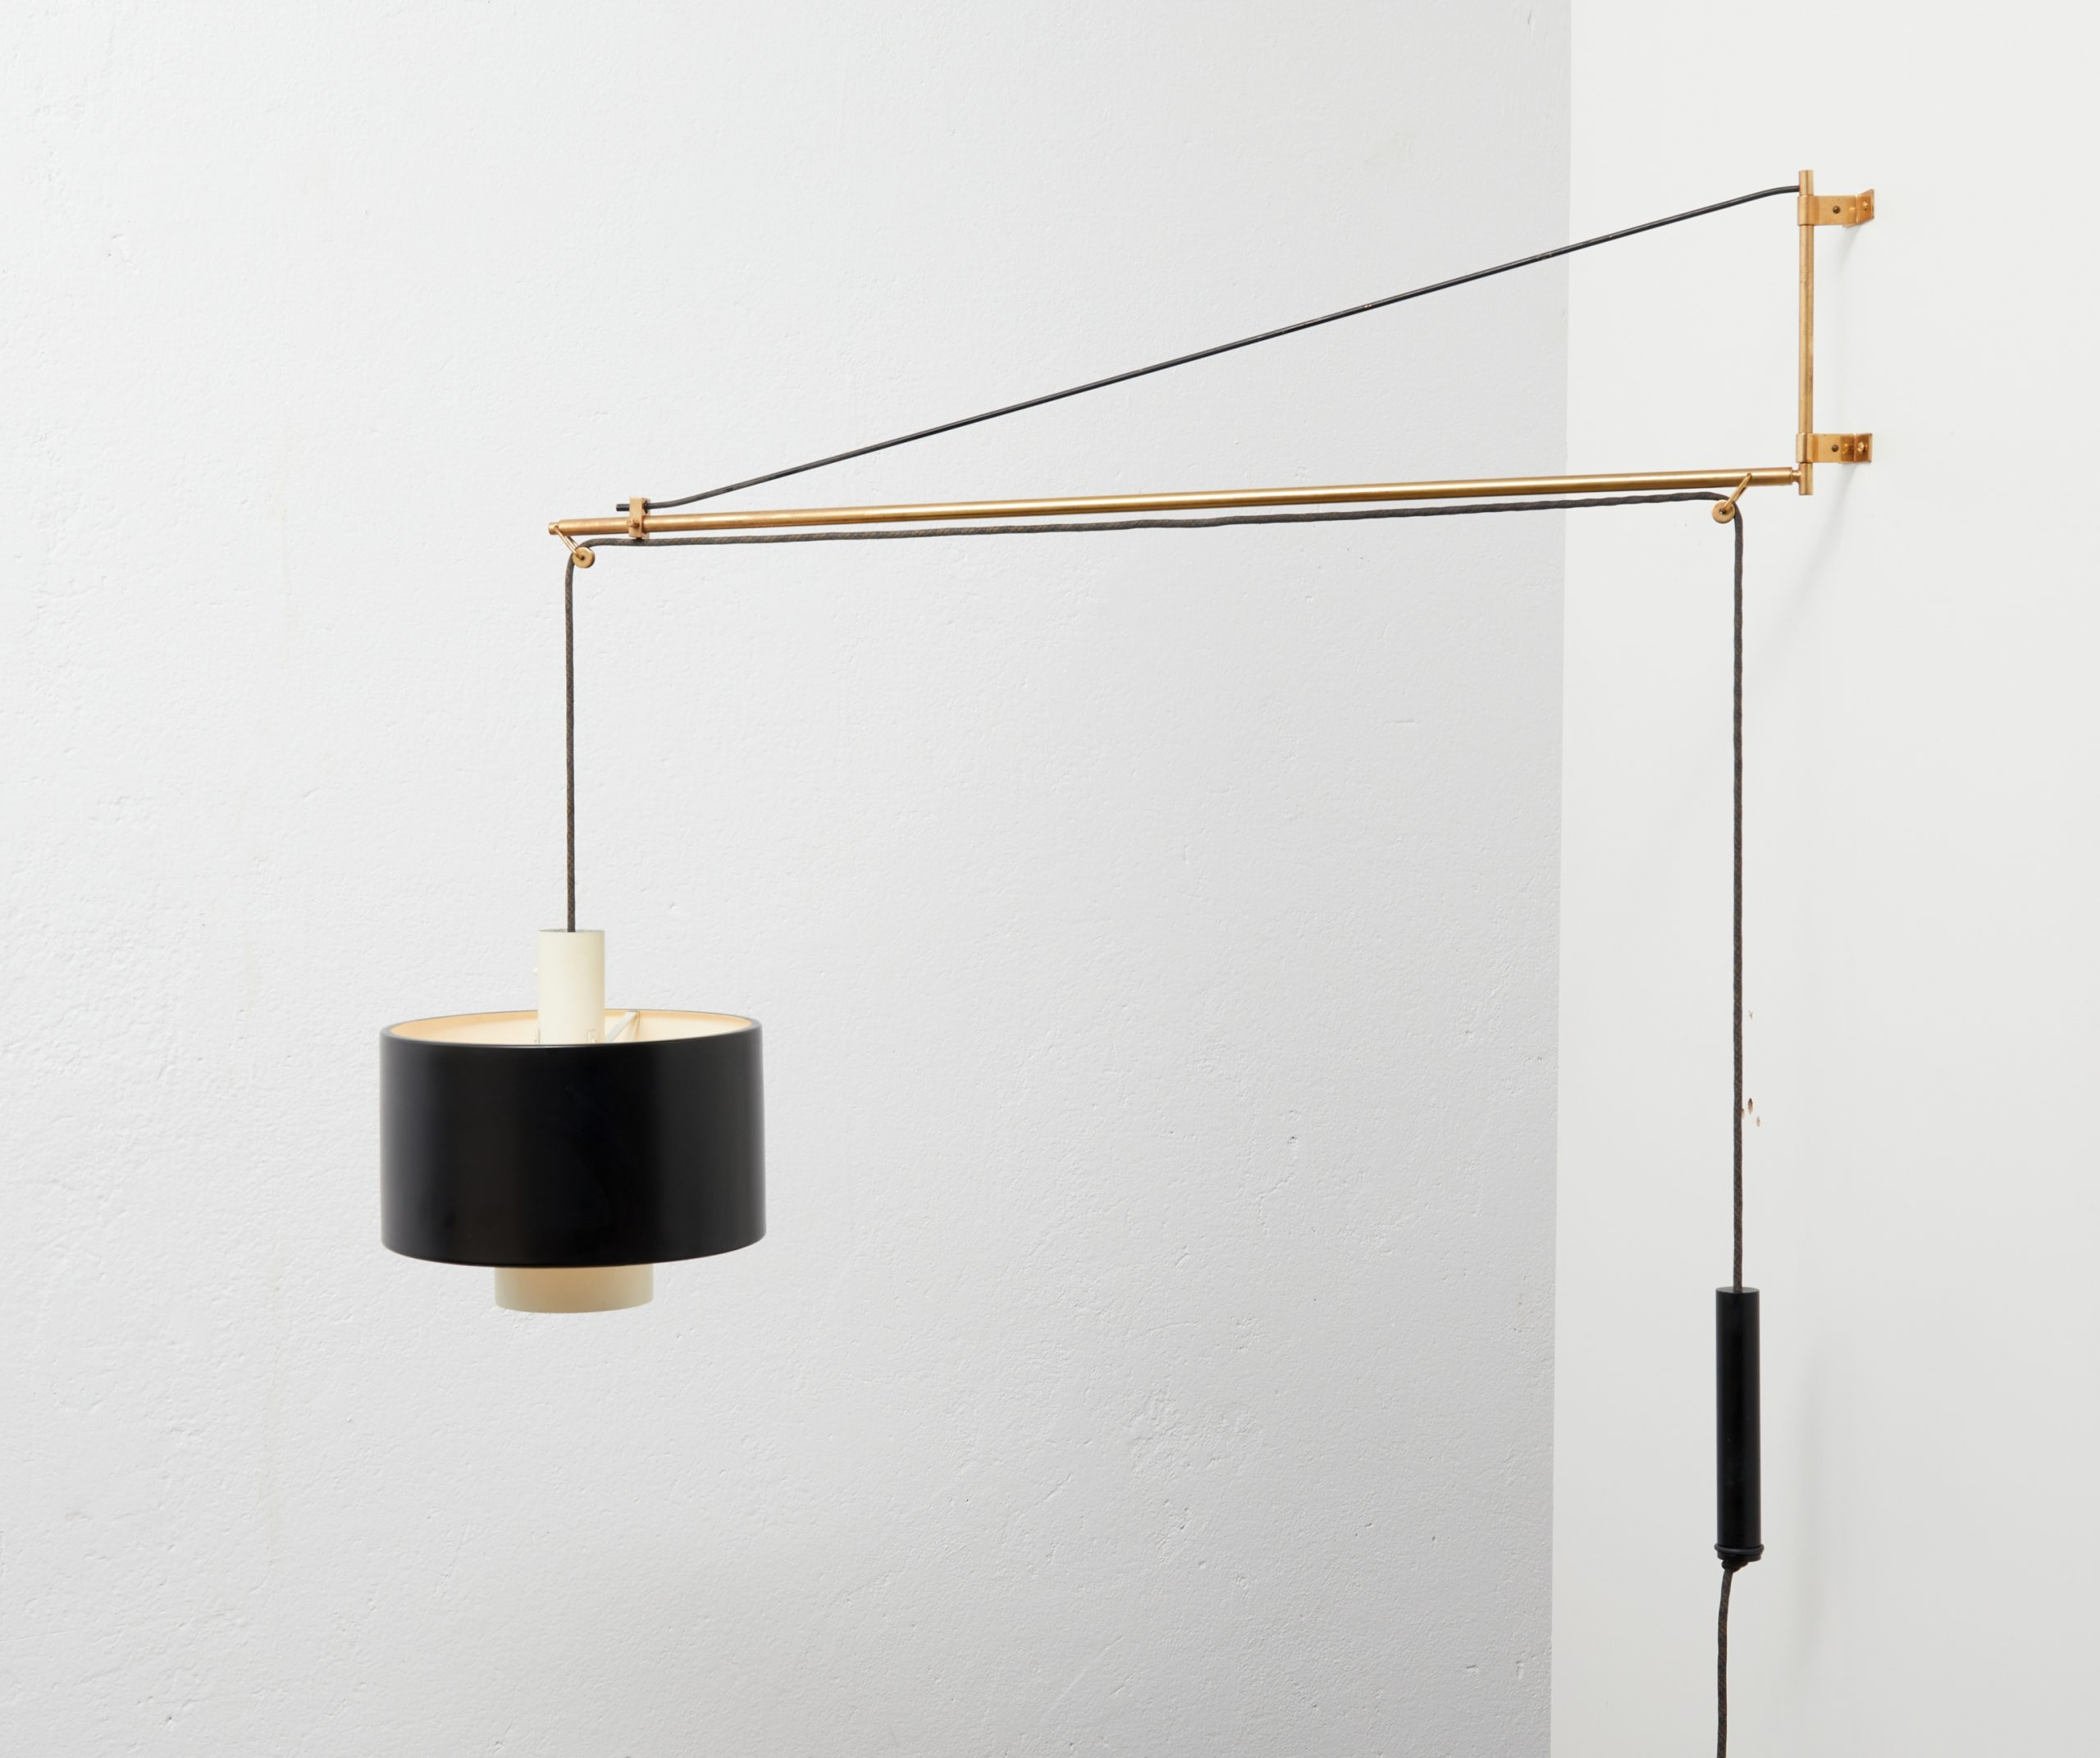 brass-wall-lamp-model-2061-by-gaetano-scolari-for-stilnovo-1954-image-09